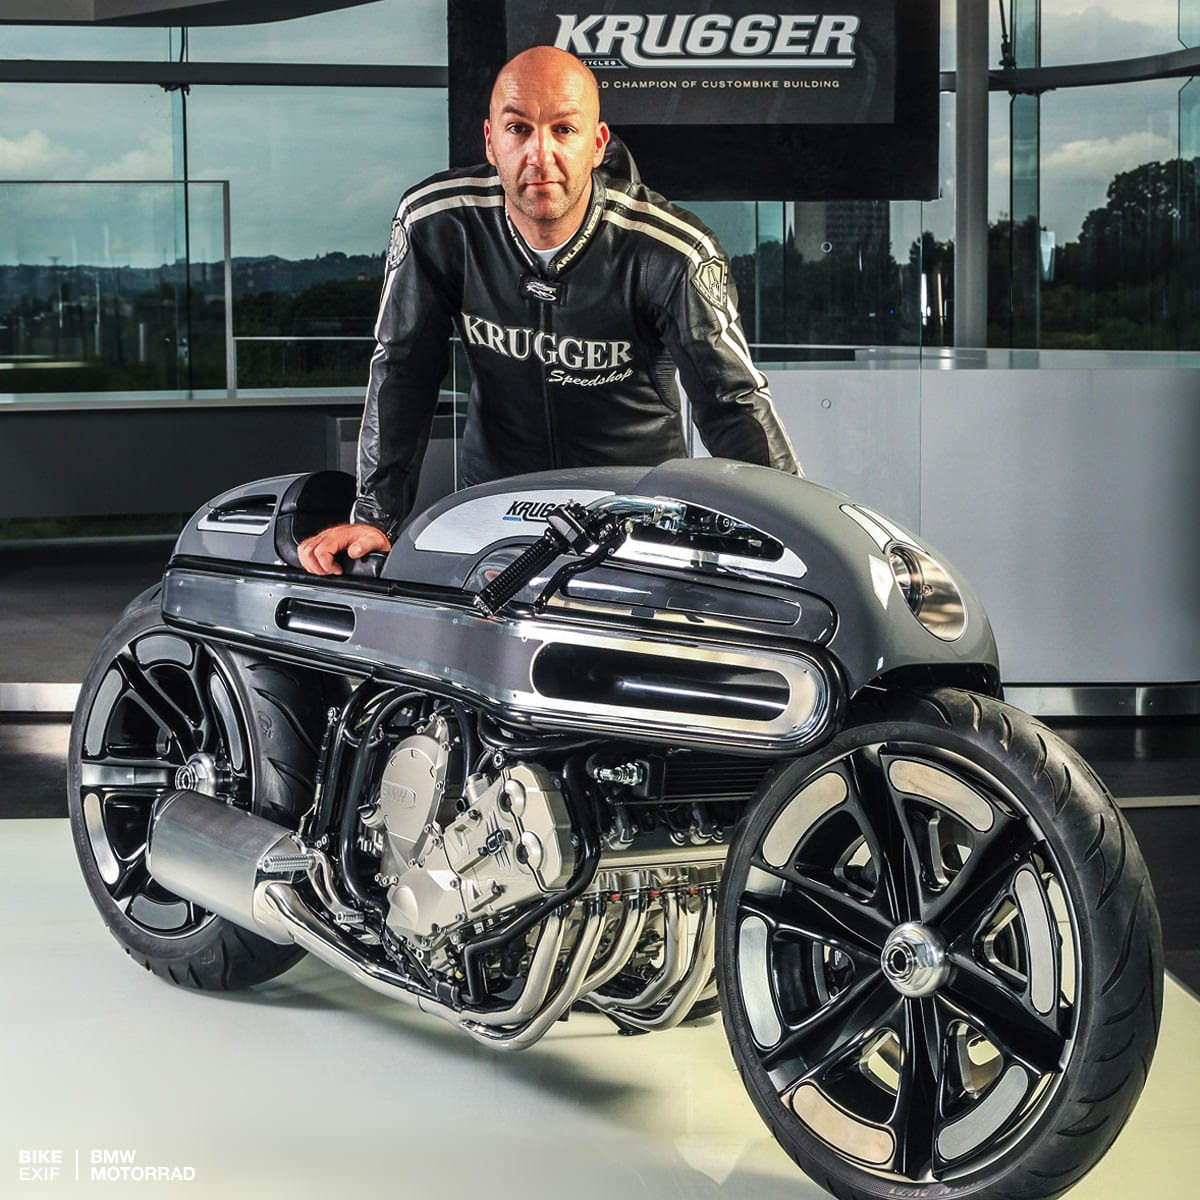 fred-krugger-bmw-k1600-custom-3a